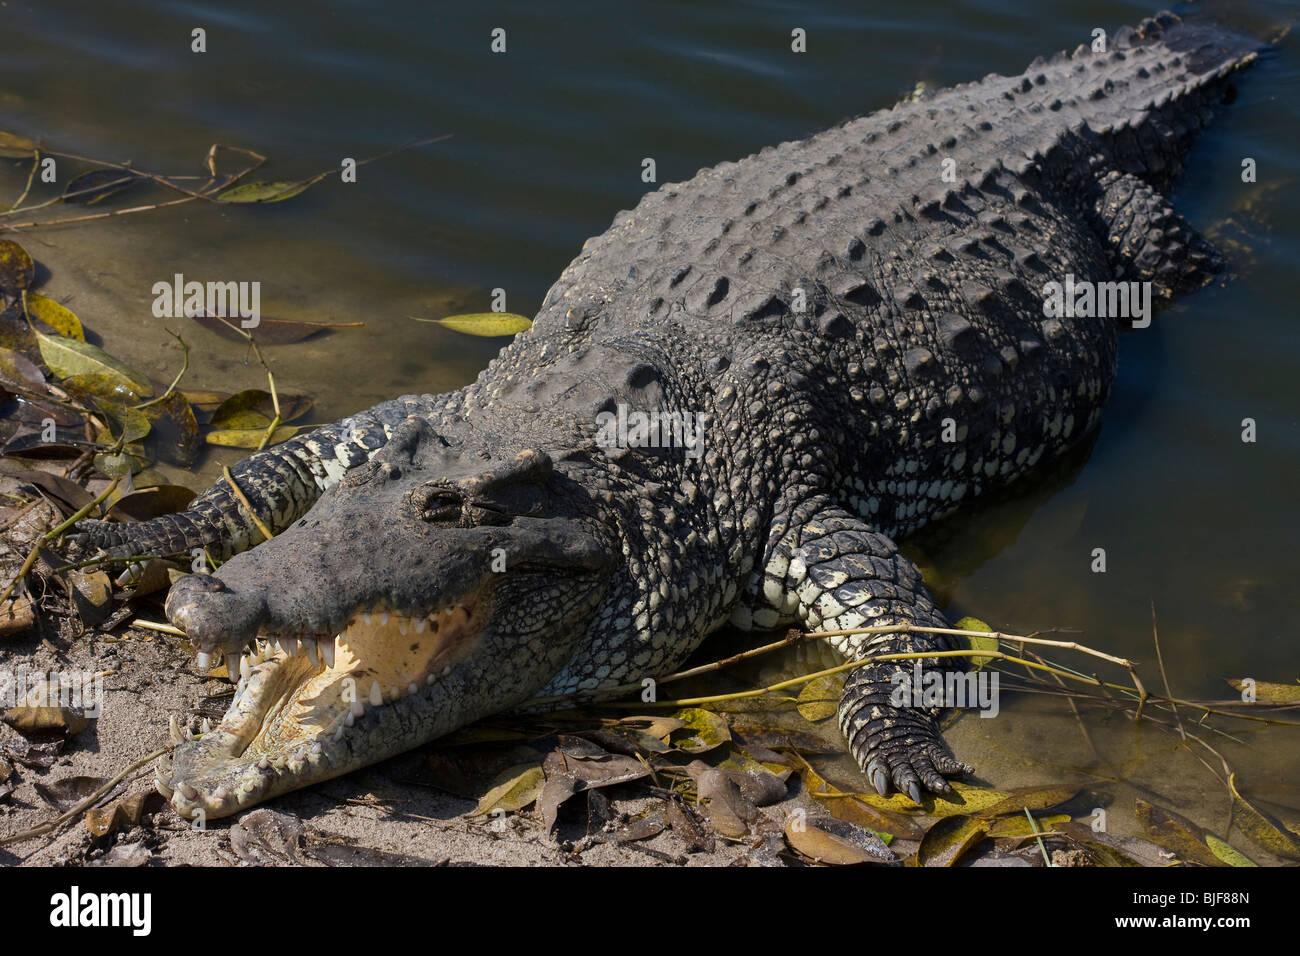 CUBAN CROCODILE (Crocodylus rhombifer) basking, Zapata swamp, Cuba. Critically endangered species. Captive. Stock Photo